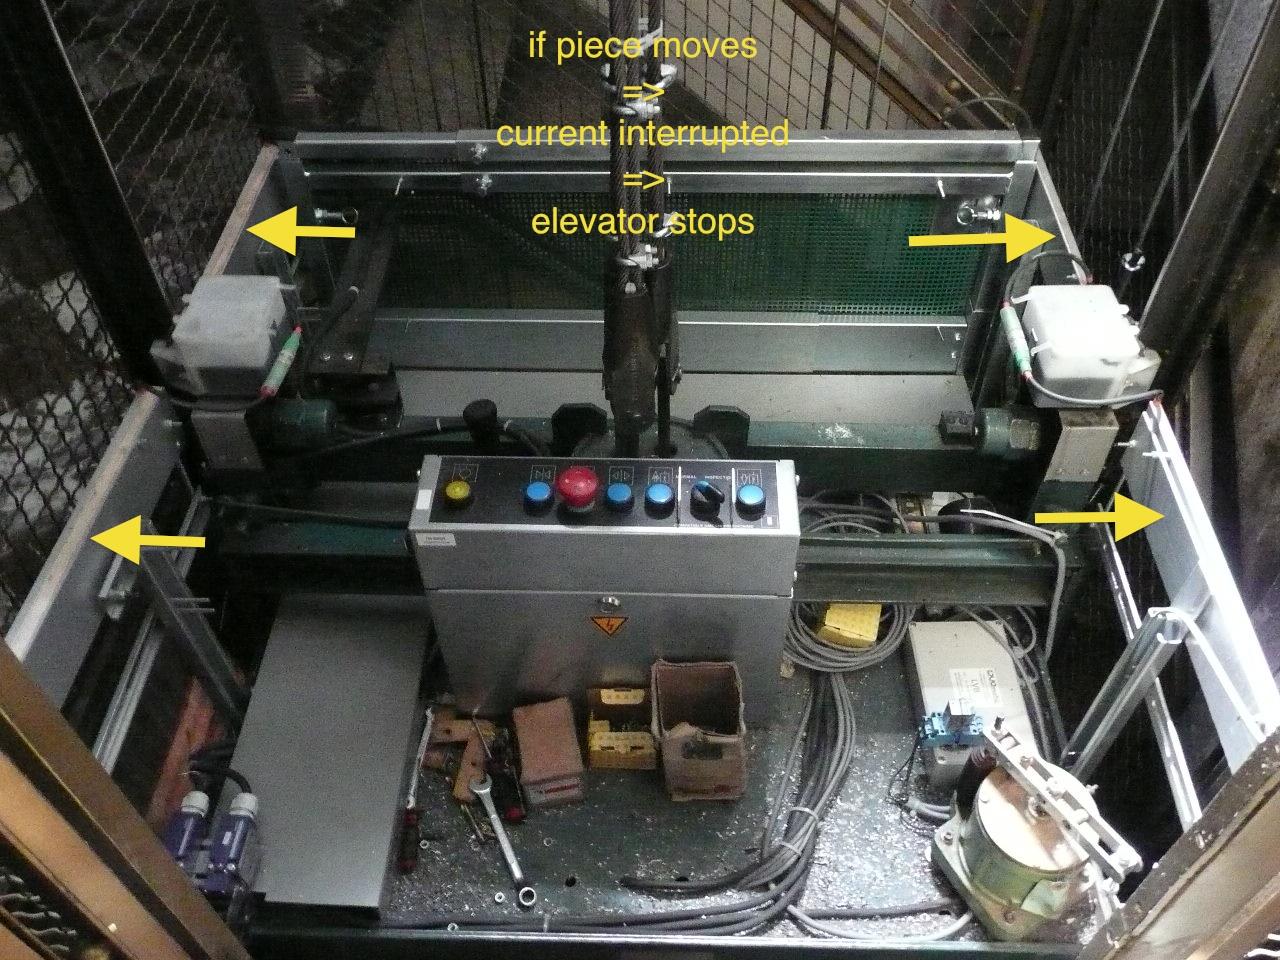 Detectors - Roof - 1 (notes).jpg